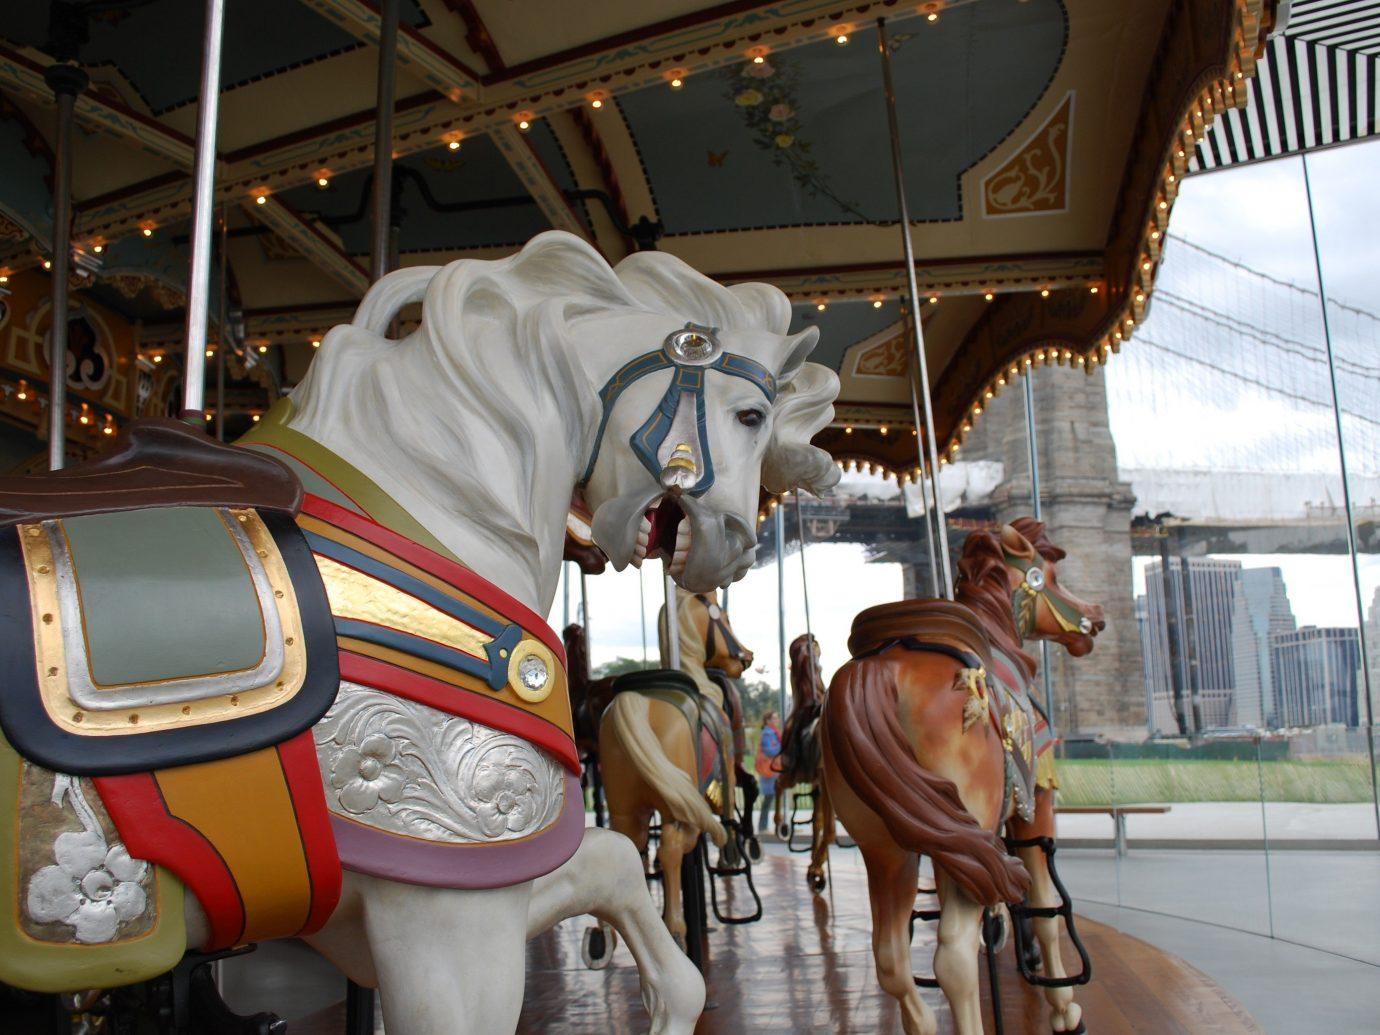 Trip Ideas amusement ride Carousel amusement park horse indoor tourist attraction horse like mammal park recreation horse harness